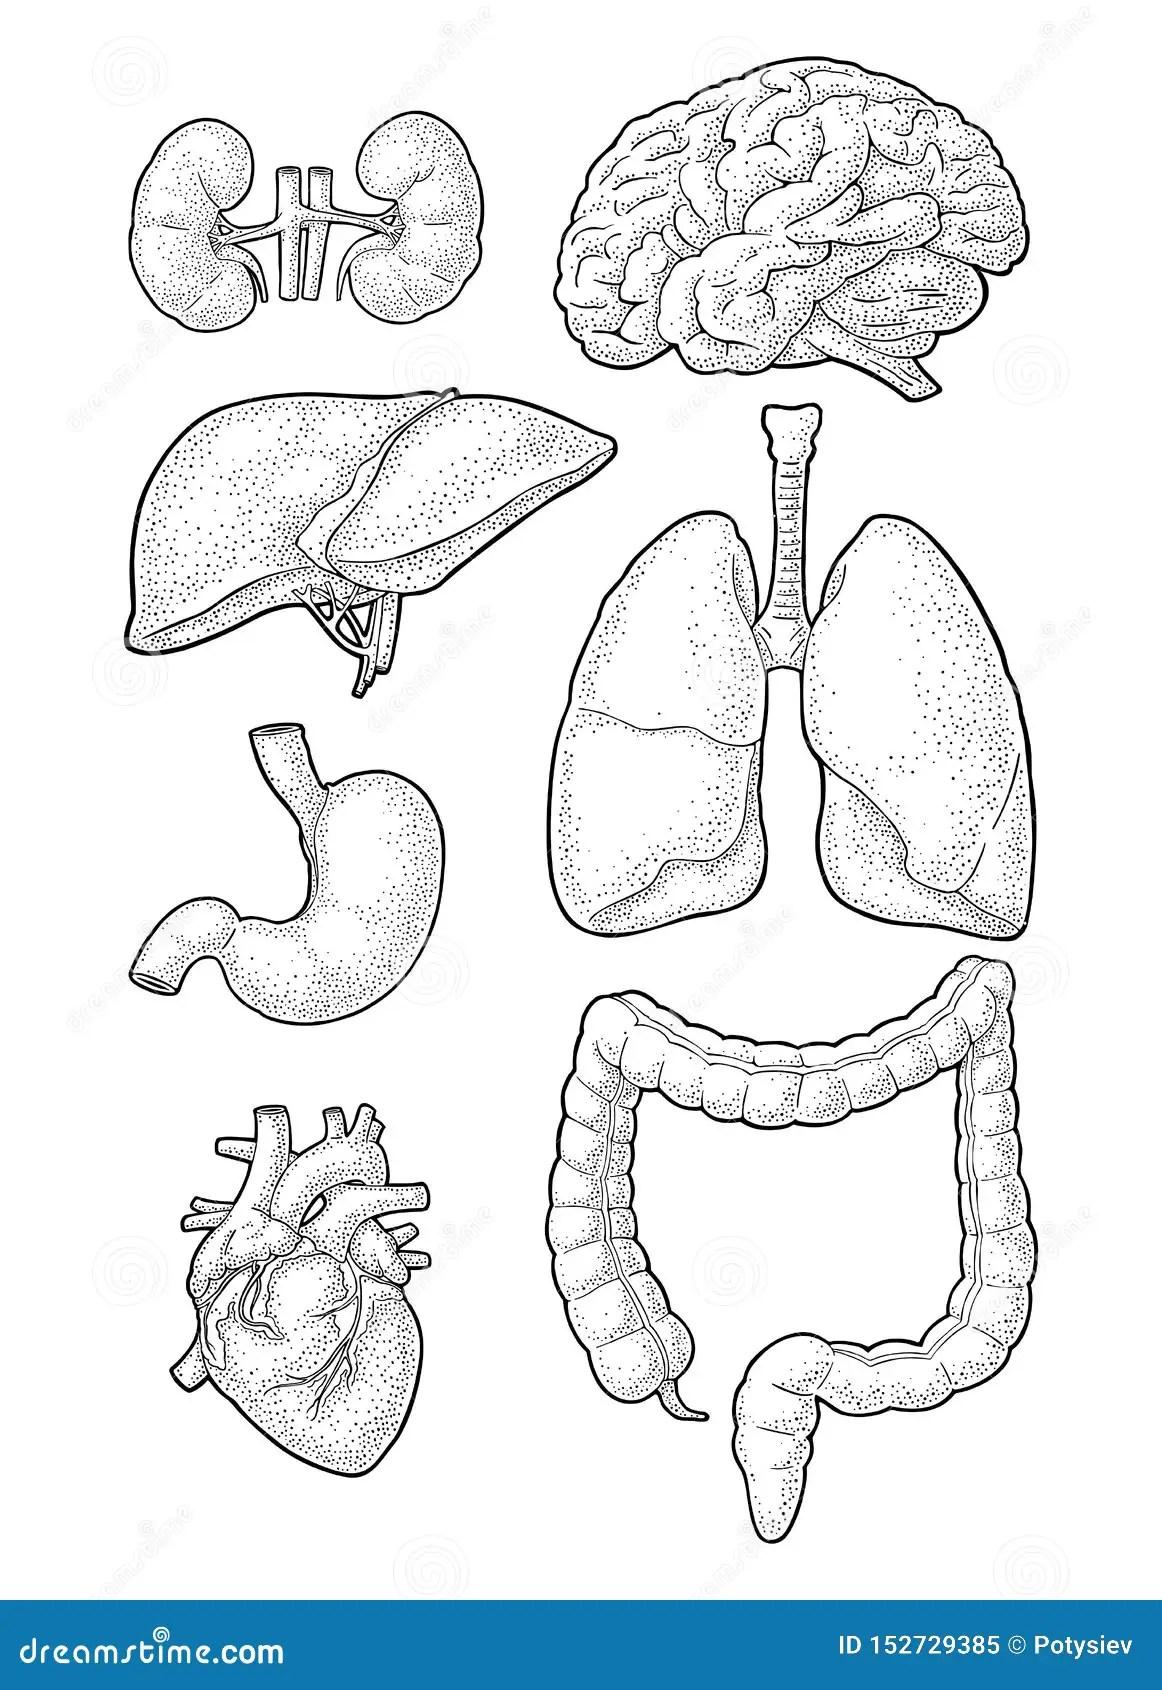 32 Label Organs